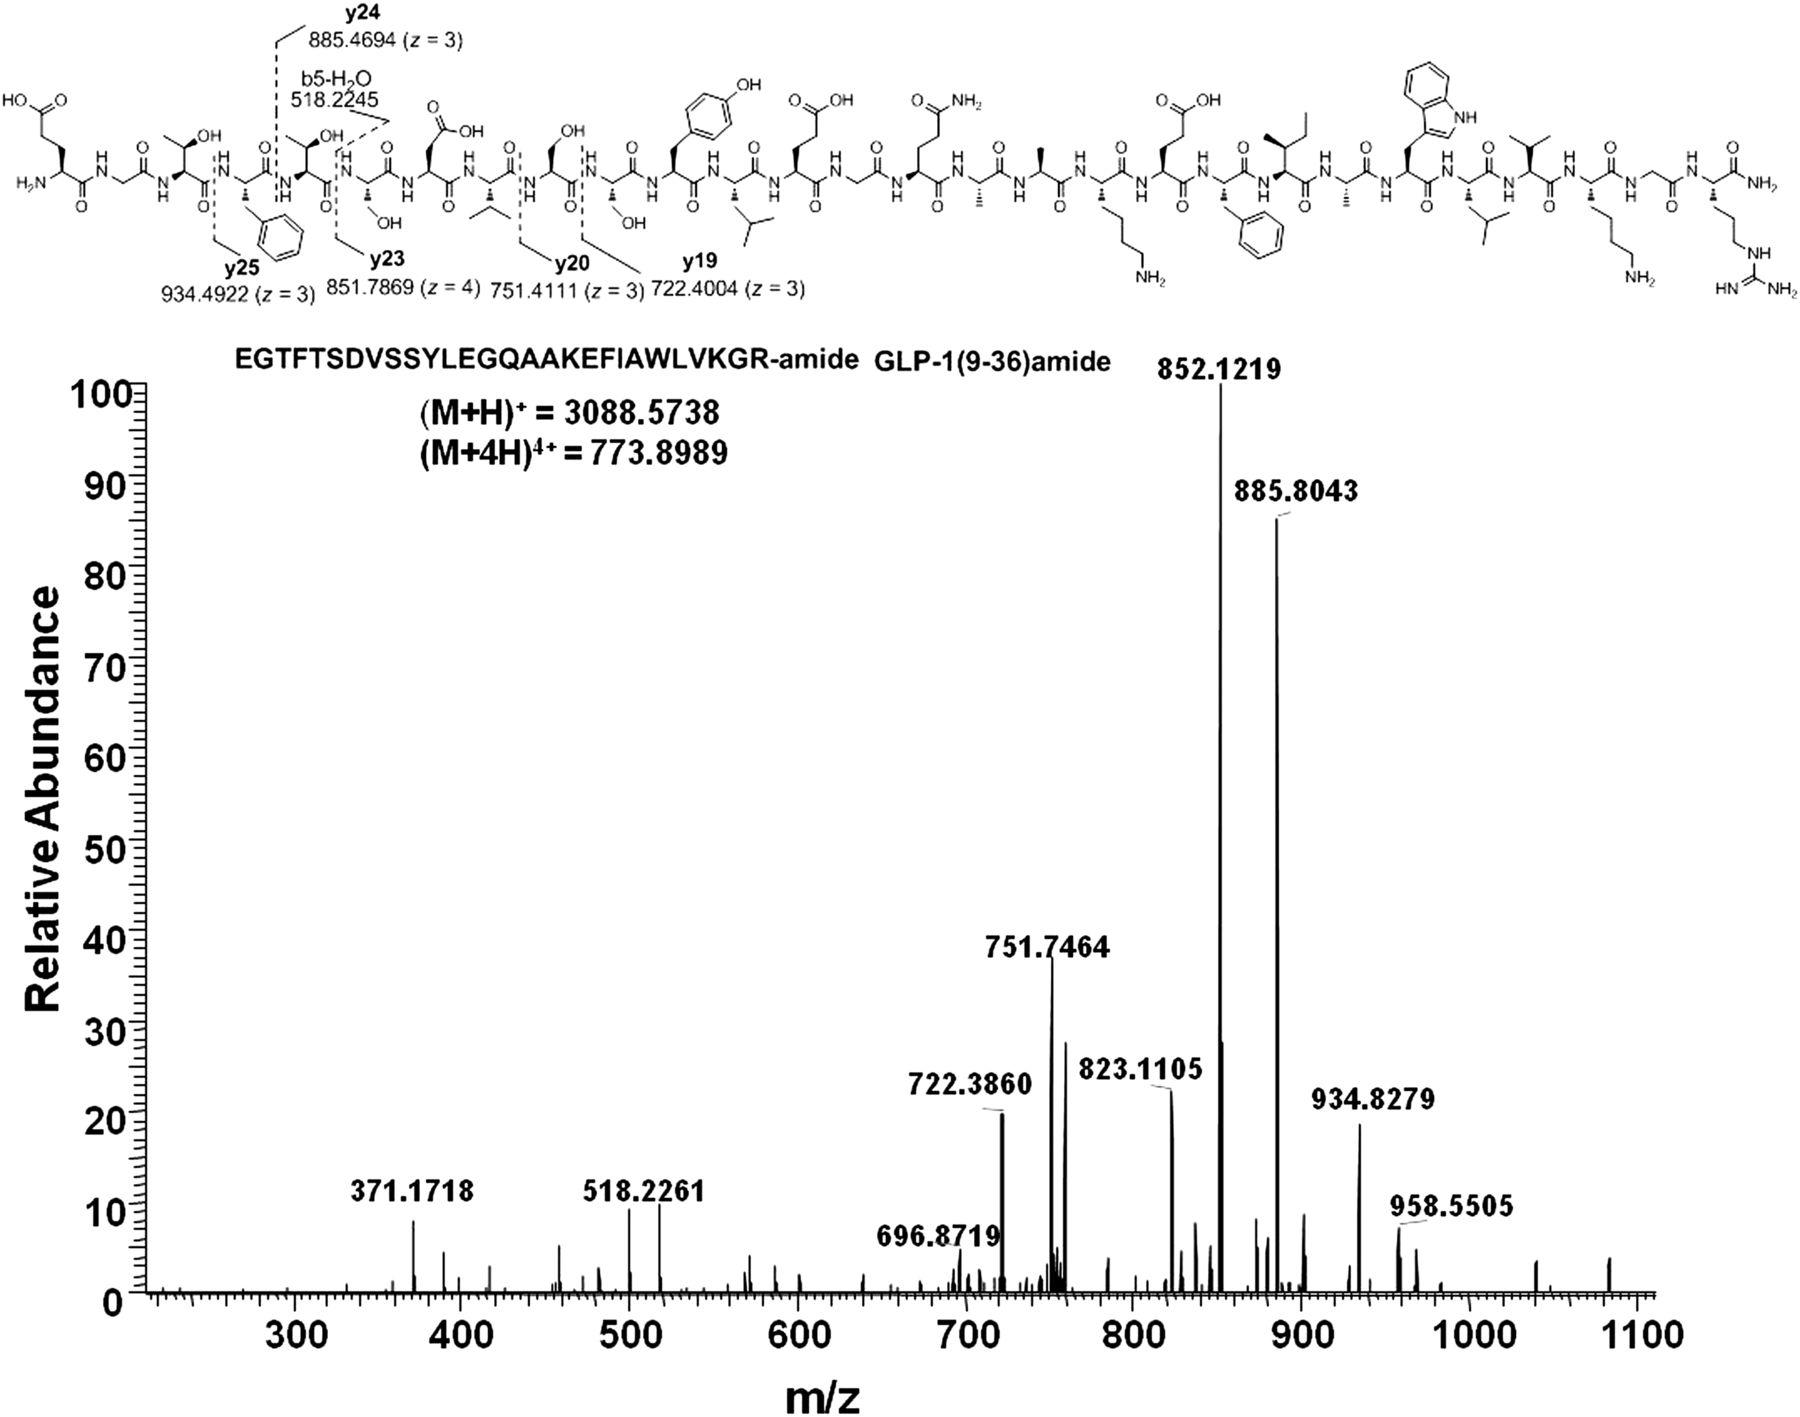 In Vitro Metabolism of the Glucagon-Like Peptide-1 (GLP-1